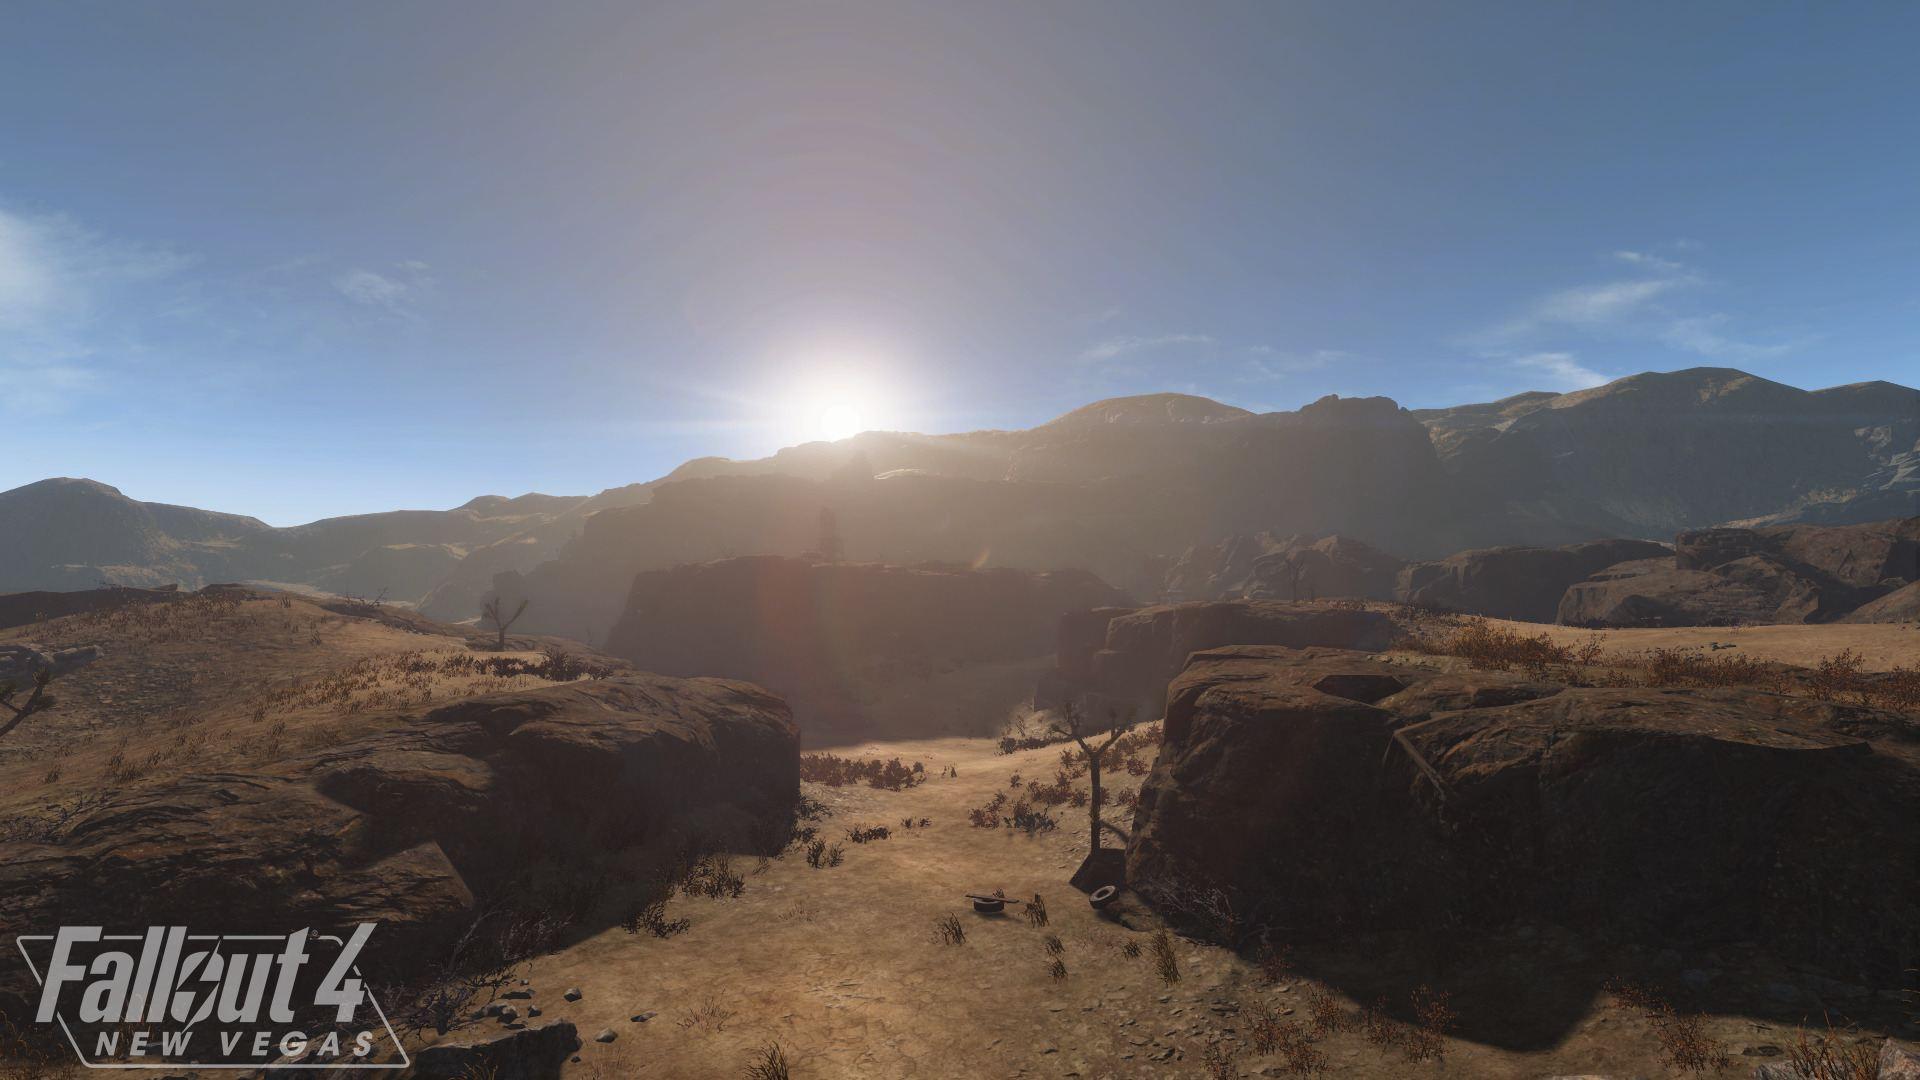 Fallout 4: New Vegas - Fallout 4